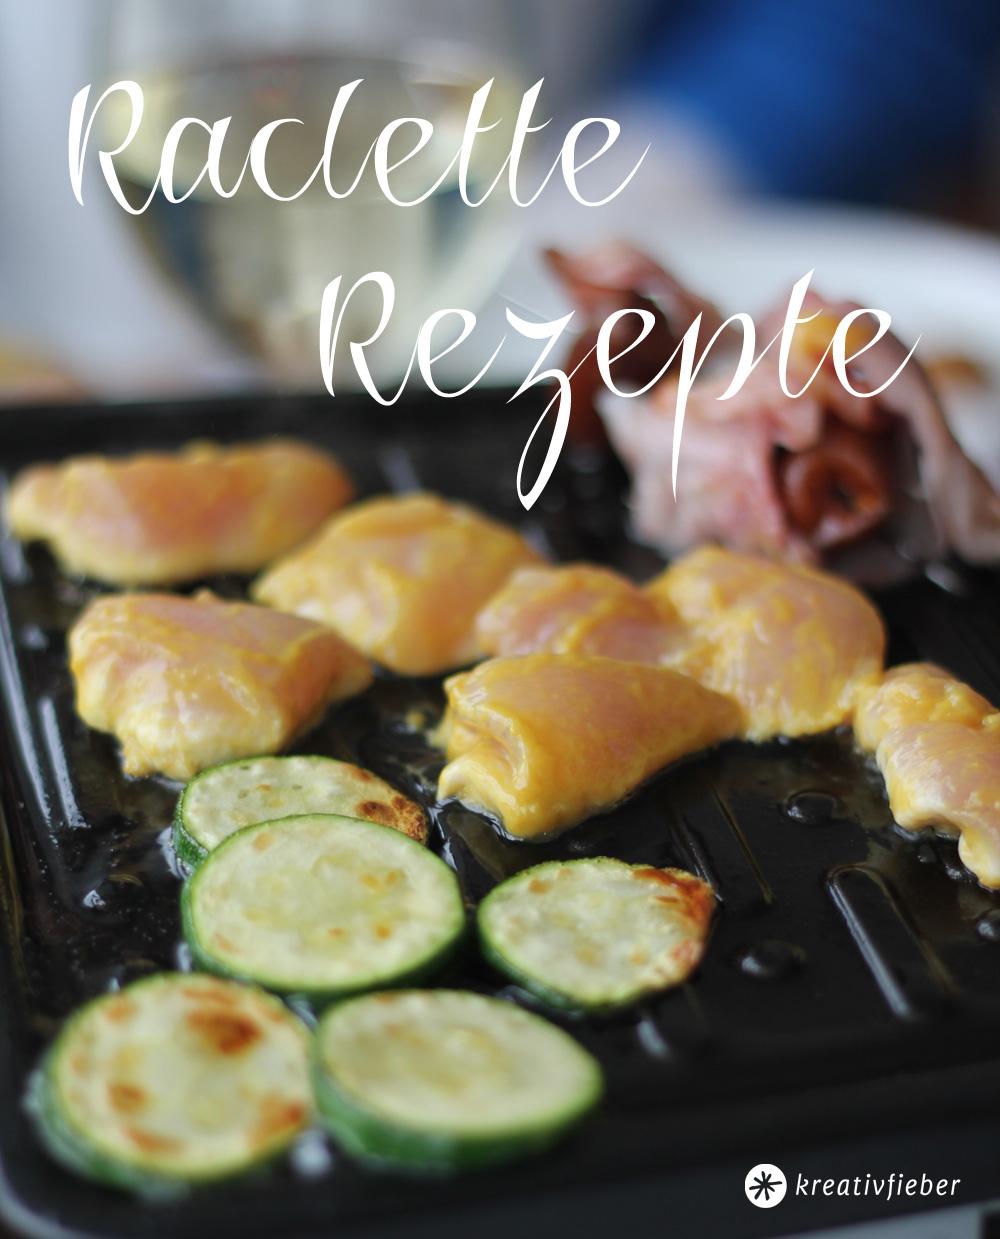 raclette rezepte mit fruchtsenf und chilisenf rezeptsammlung. Black Bedroom Furniture Sets. Home Design Ideas